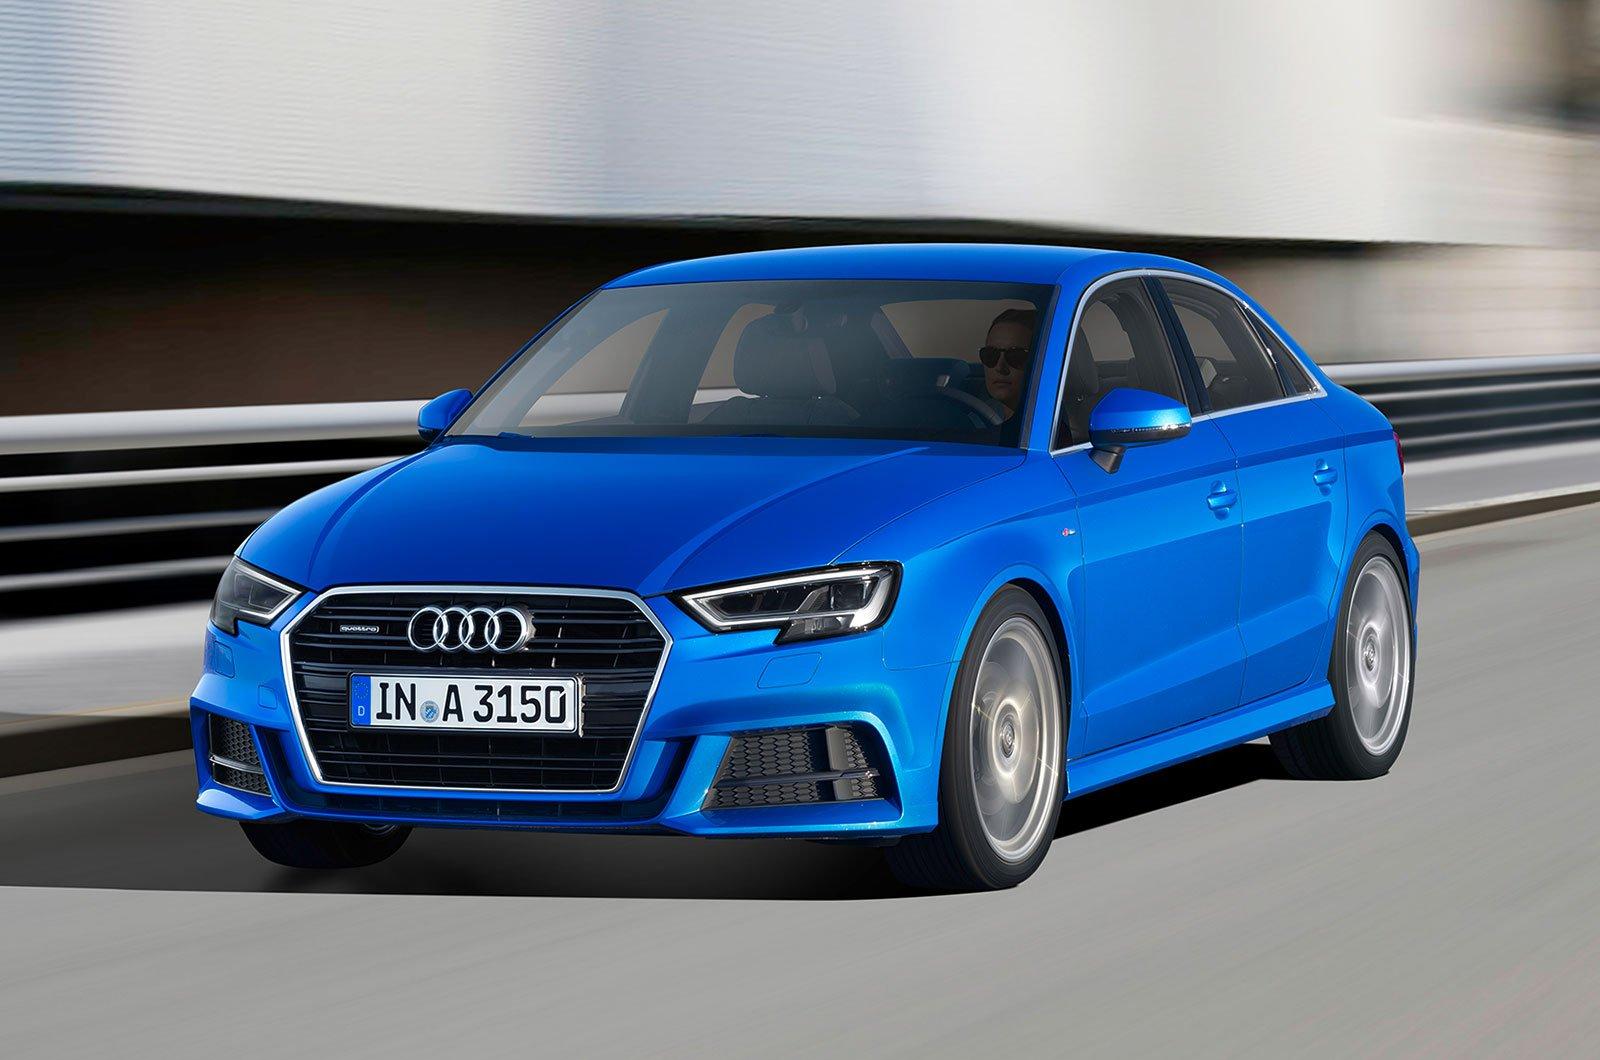 Audi A3 Saloon executive cars